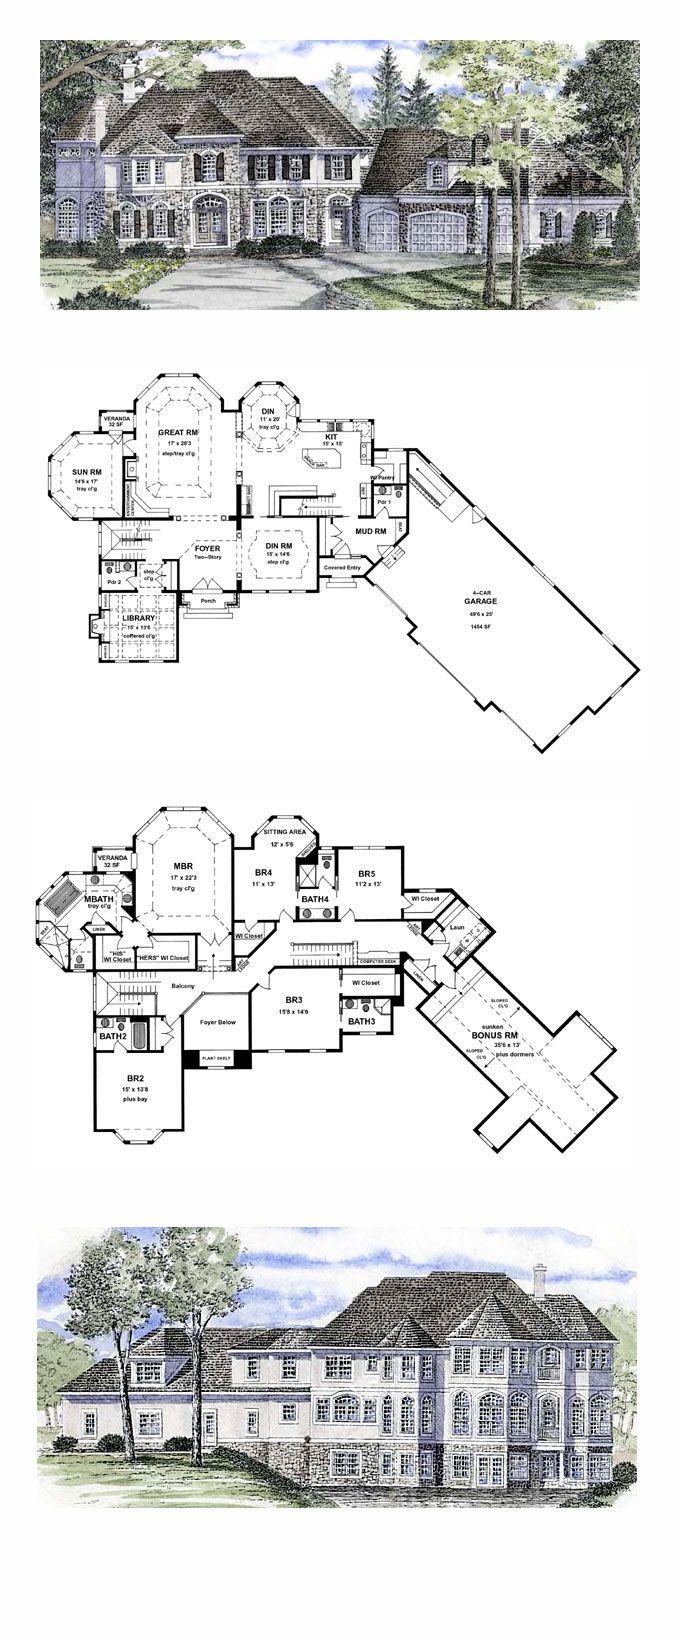 Top 25+ best 4 bedroom house ideas on Pinterest | 4 bedroom house ...